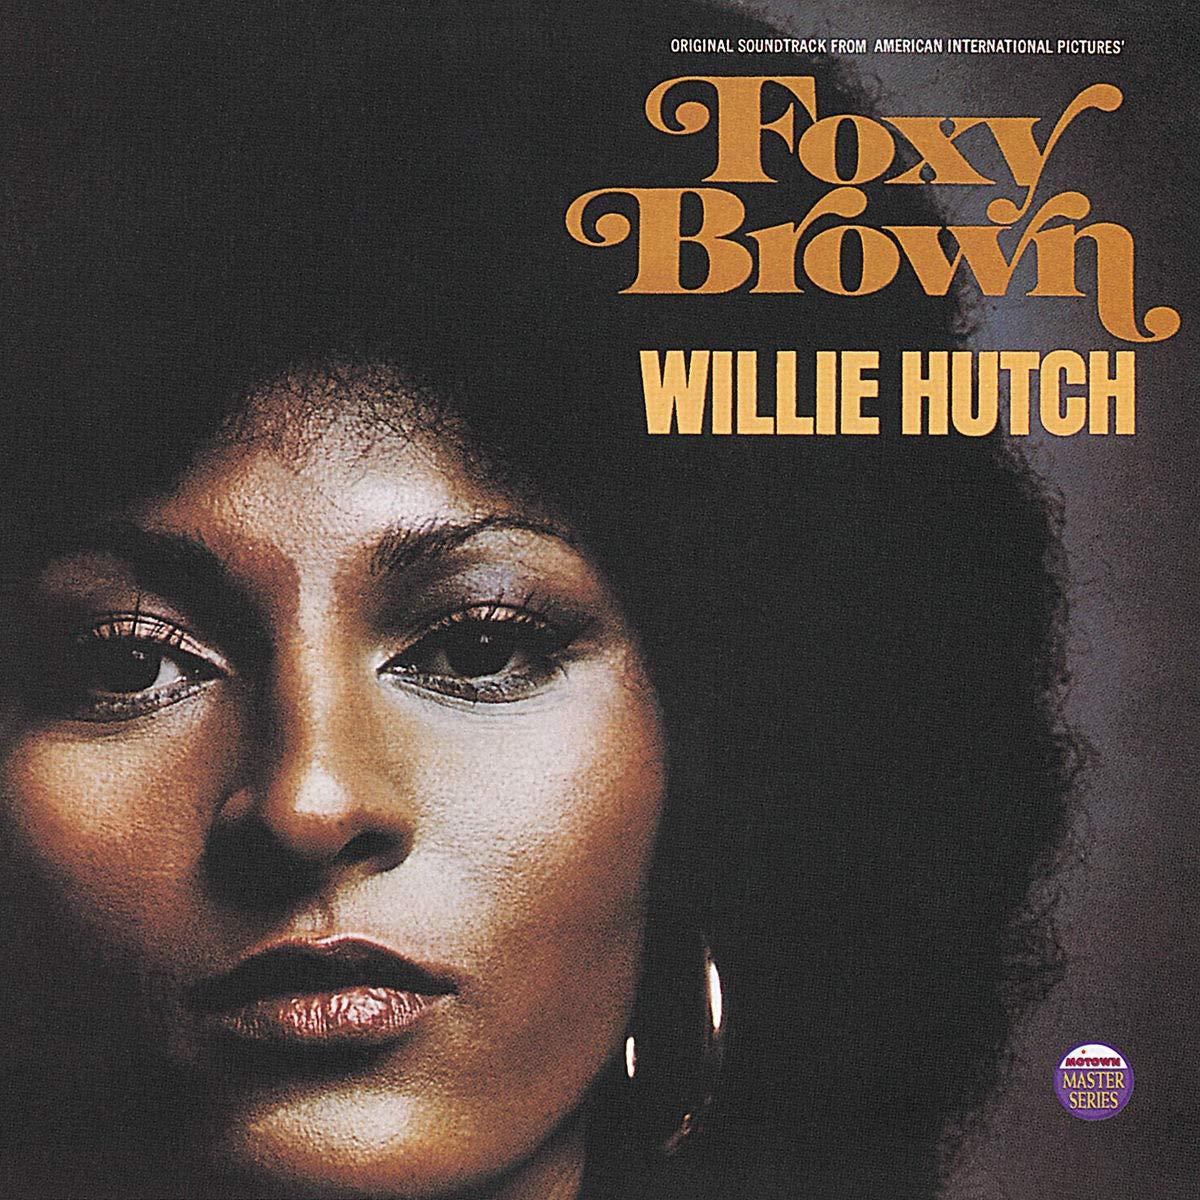 Вилли Хатч Willie Hutch. Foxy Brown (LP) юбка hutch